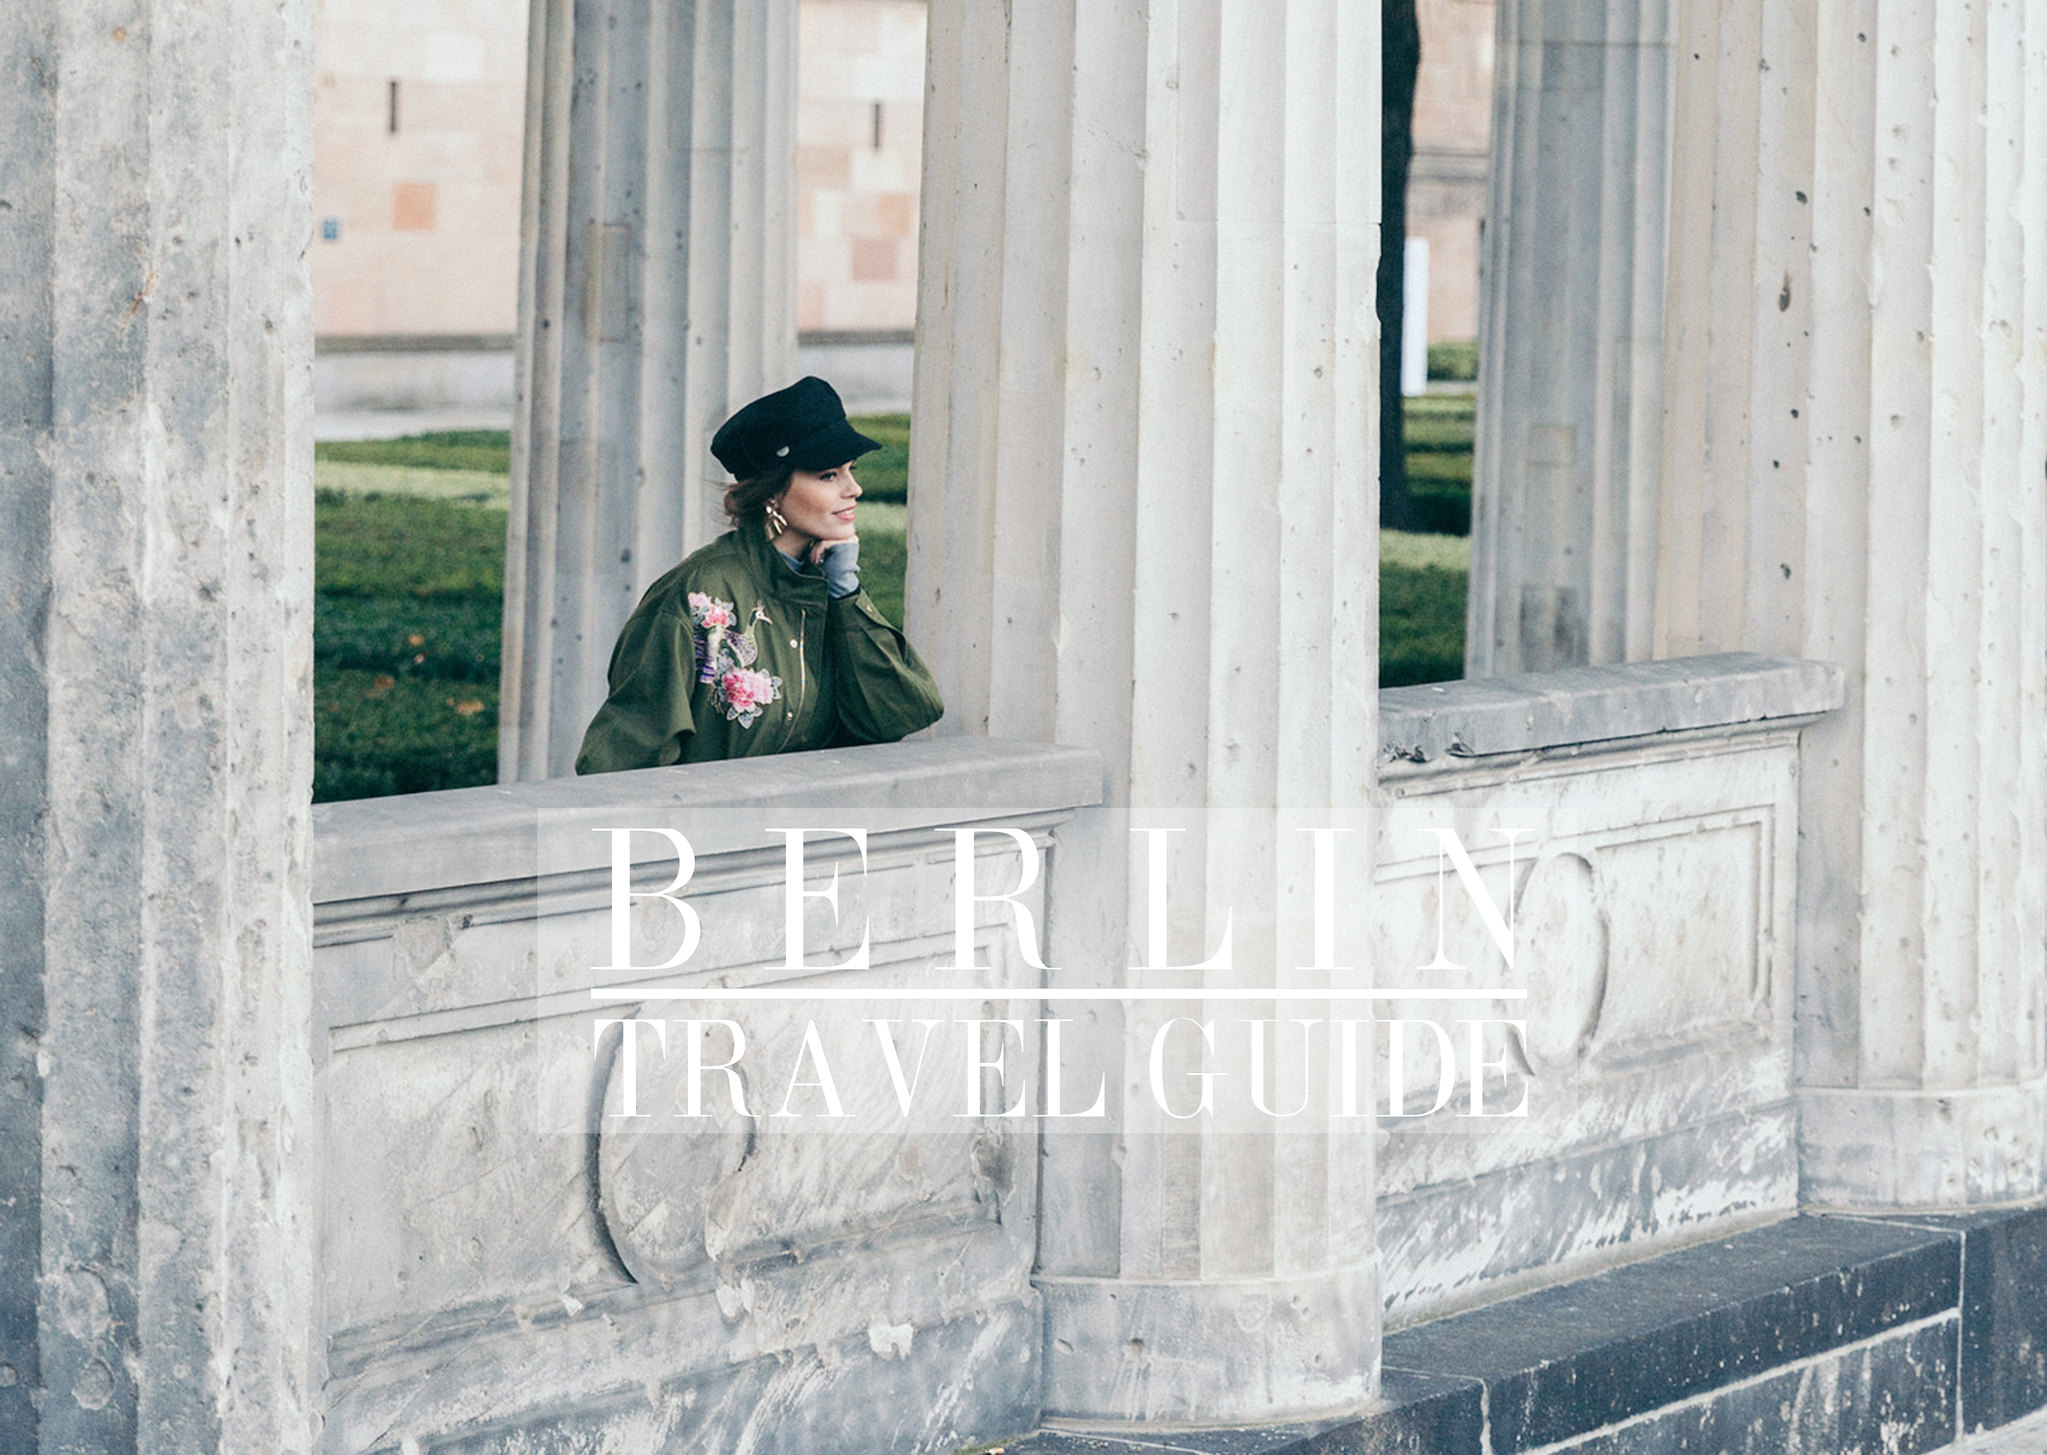 berlin travel guide portada